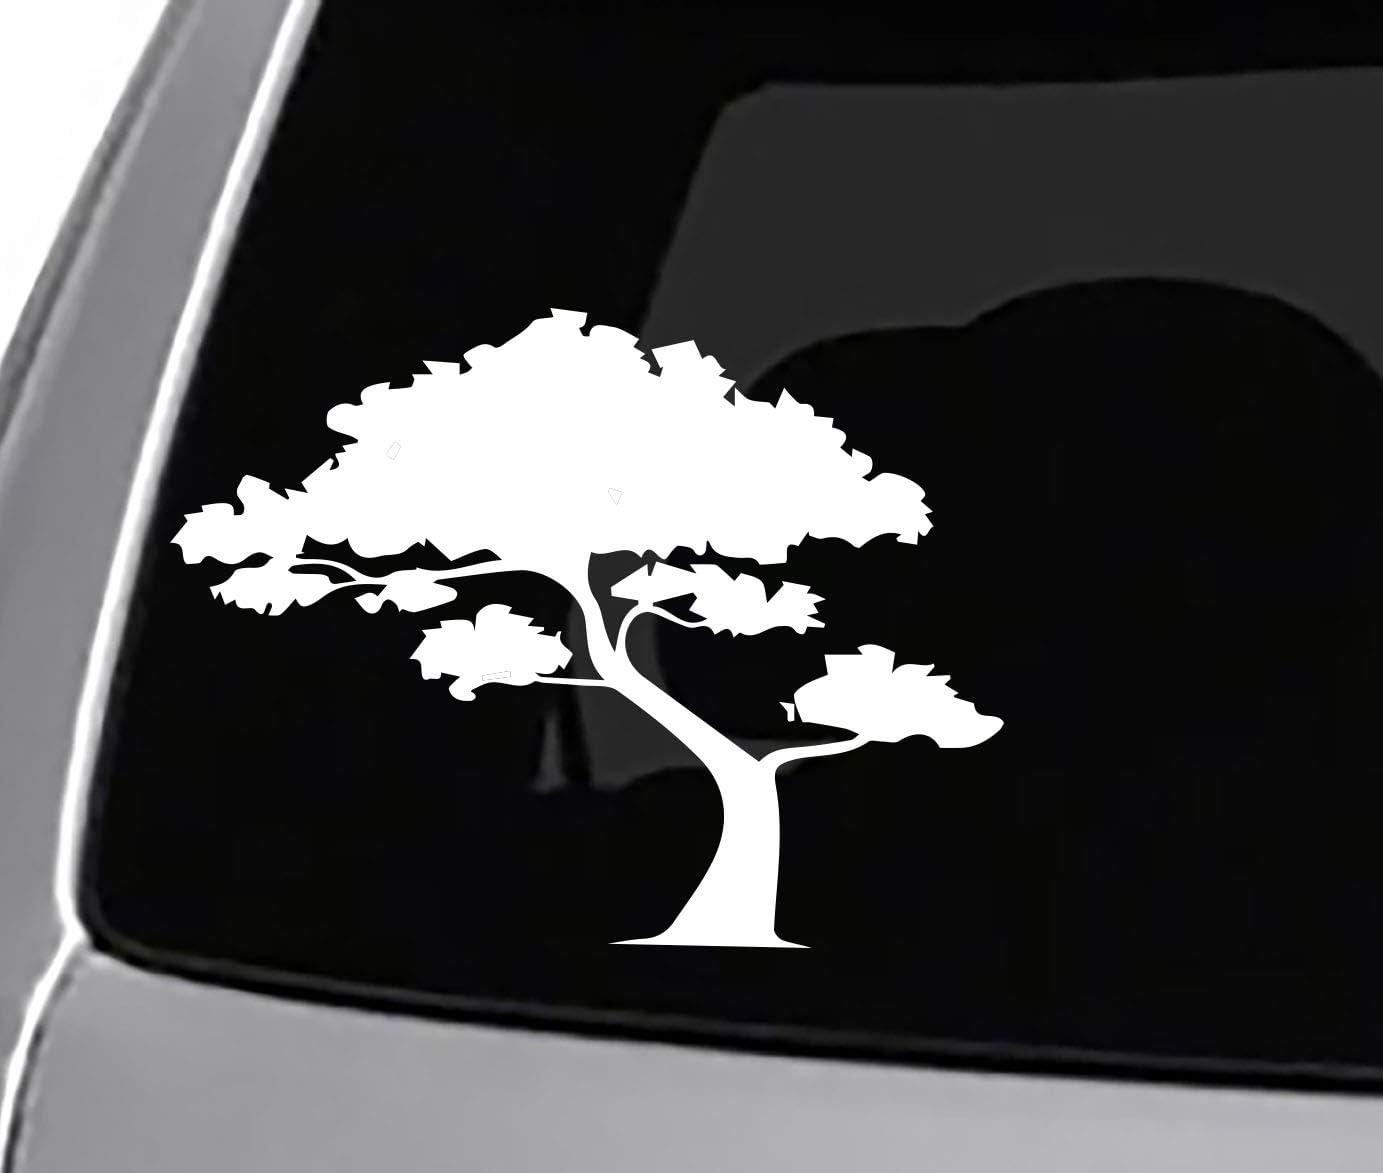 Mirror Window Decal Funny Car 23 x STARS Sticker Pack Sheet Wall